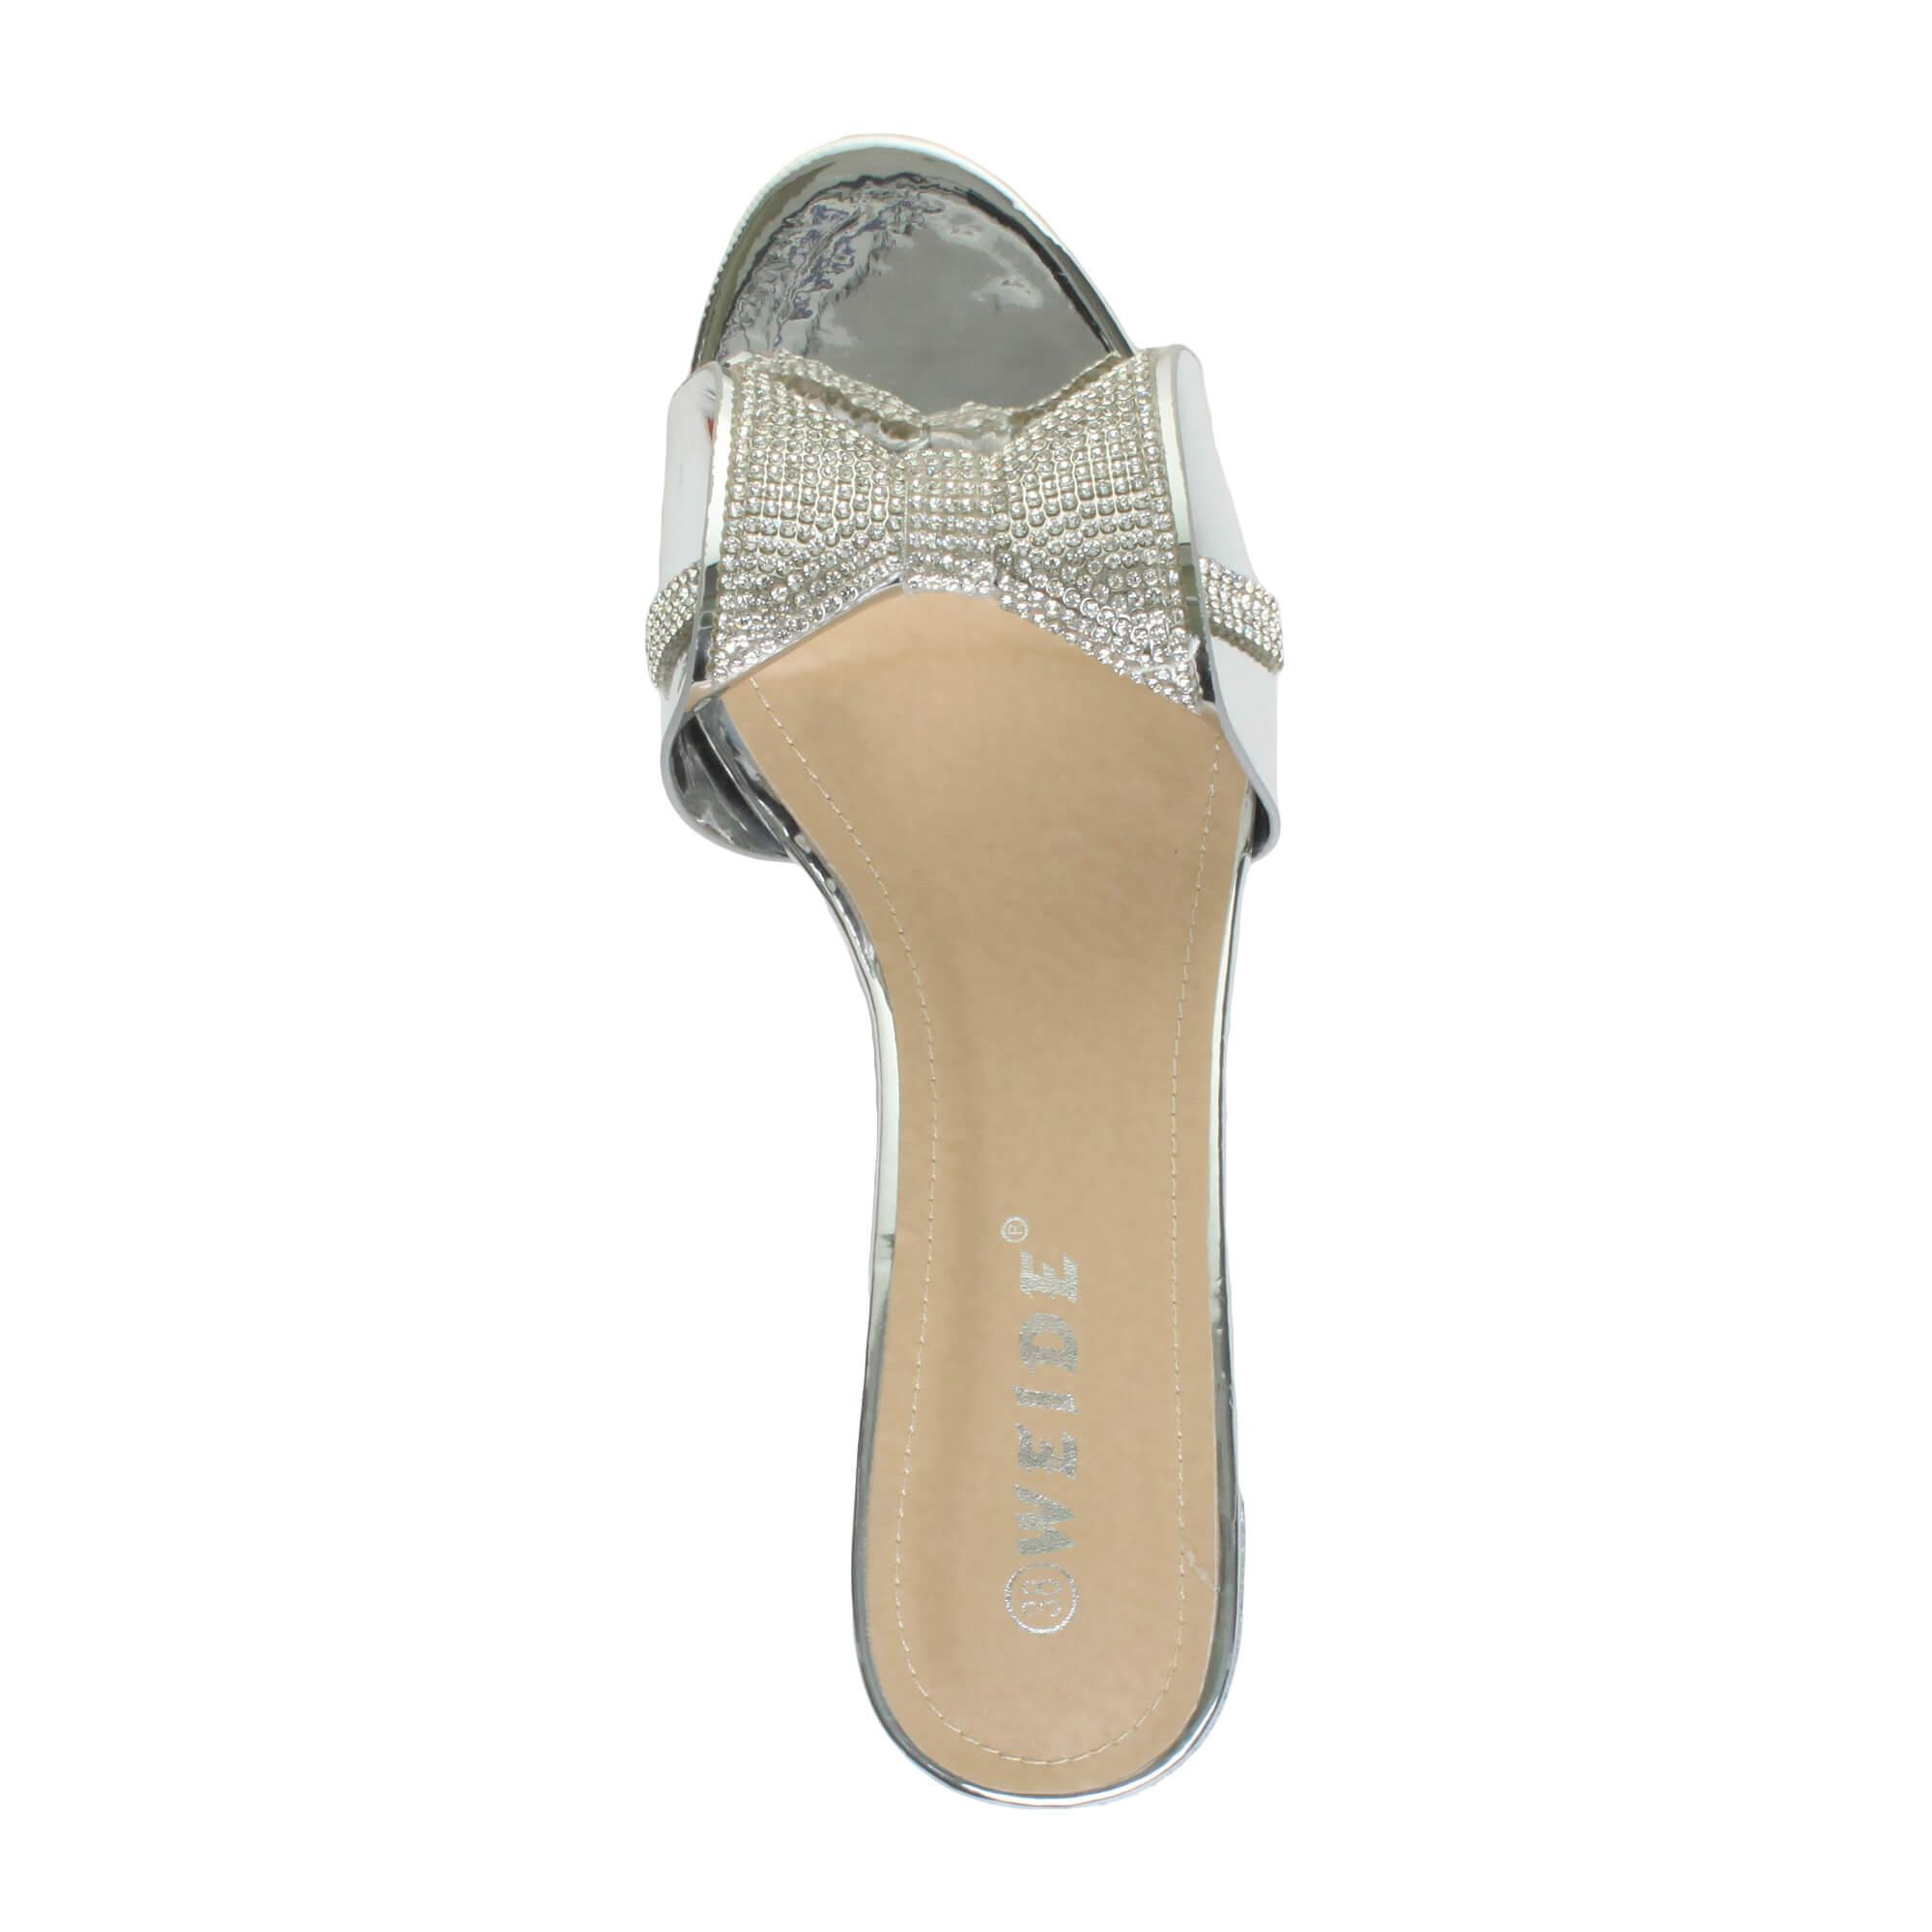 femmes talon moyen bas n ud diamante soir sandales f te tongs mules pointure ebay. Black Bedroom Furniture Sets. Home Design Ideas